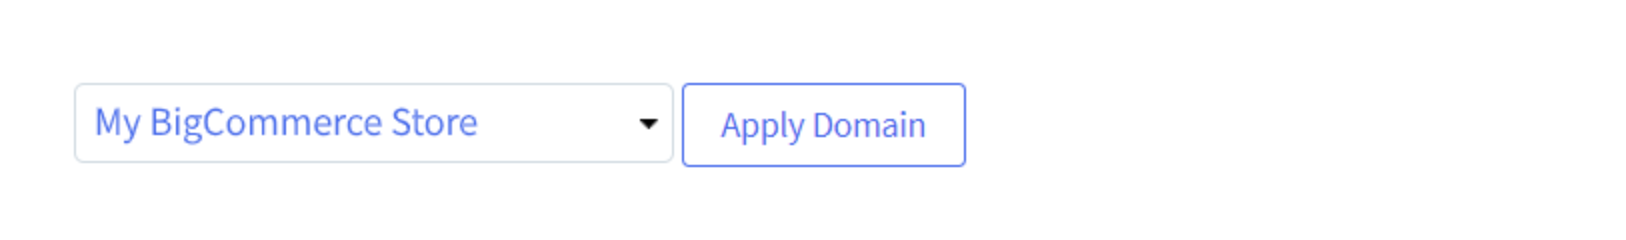 Apply domain